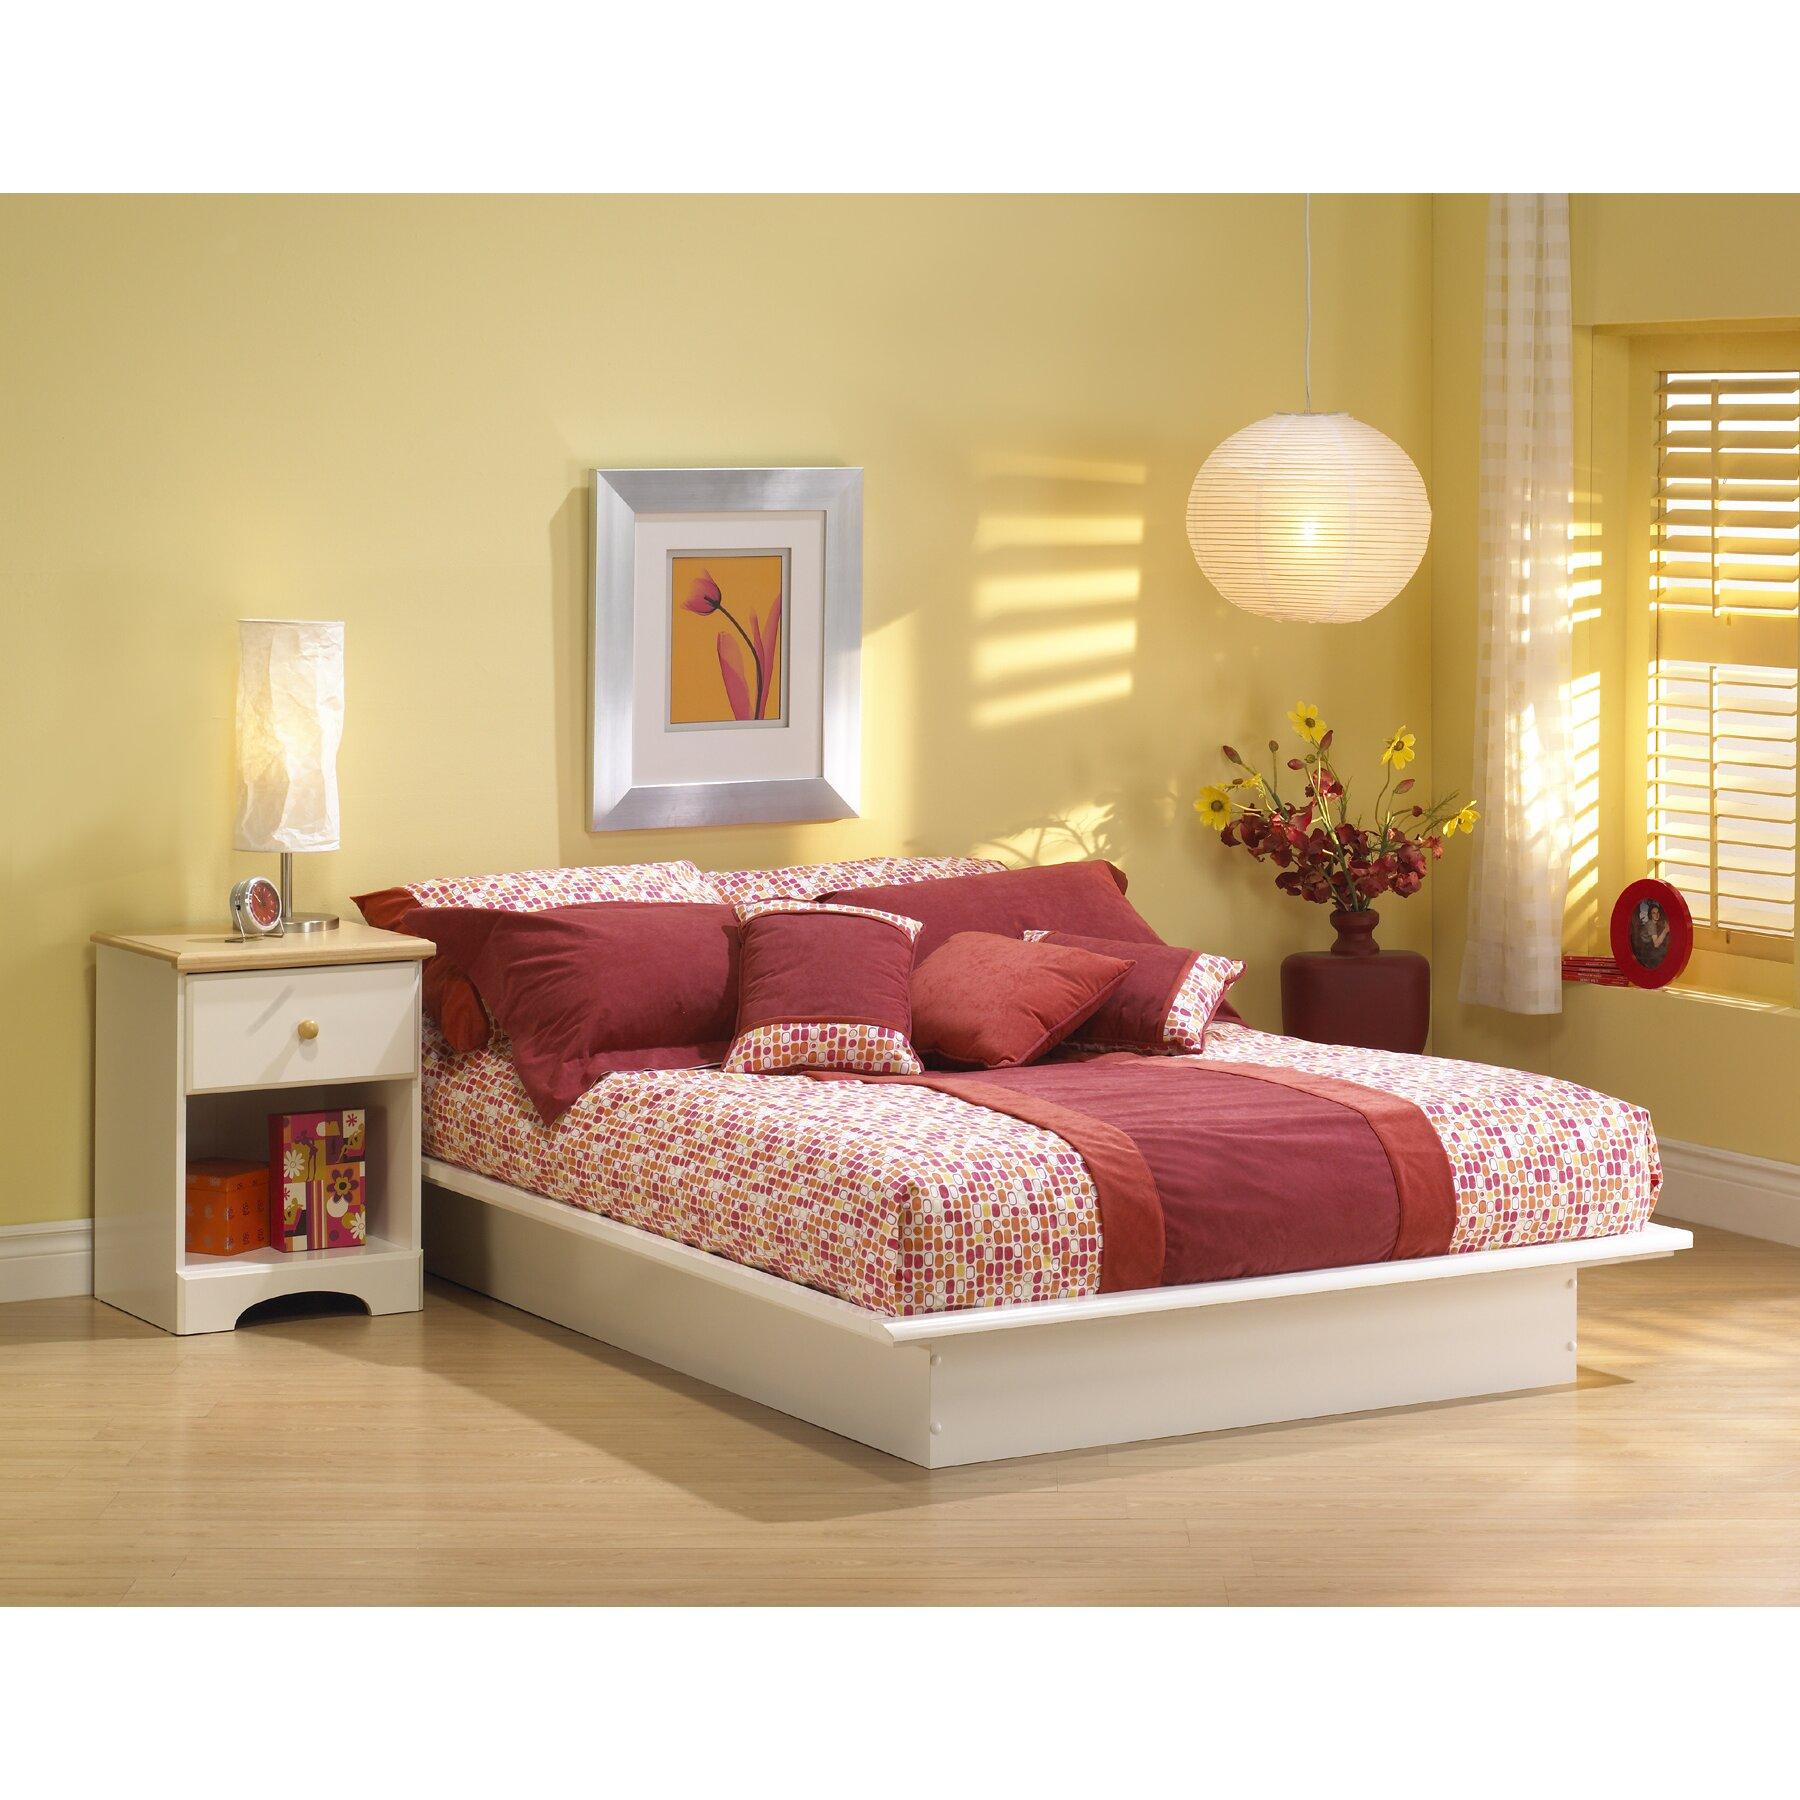 south shore newbury platform customizable bedroom set & reviews